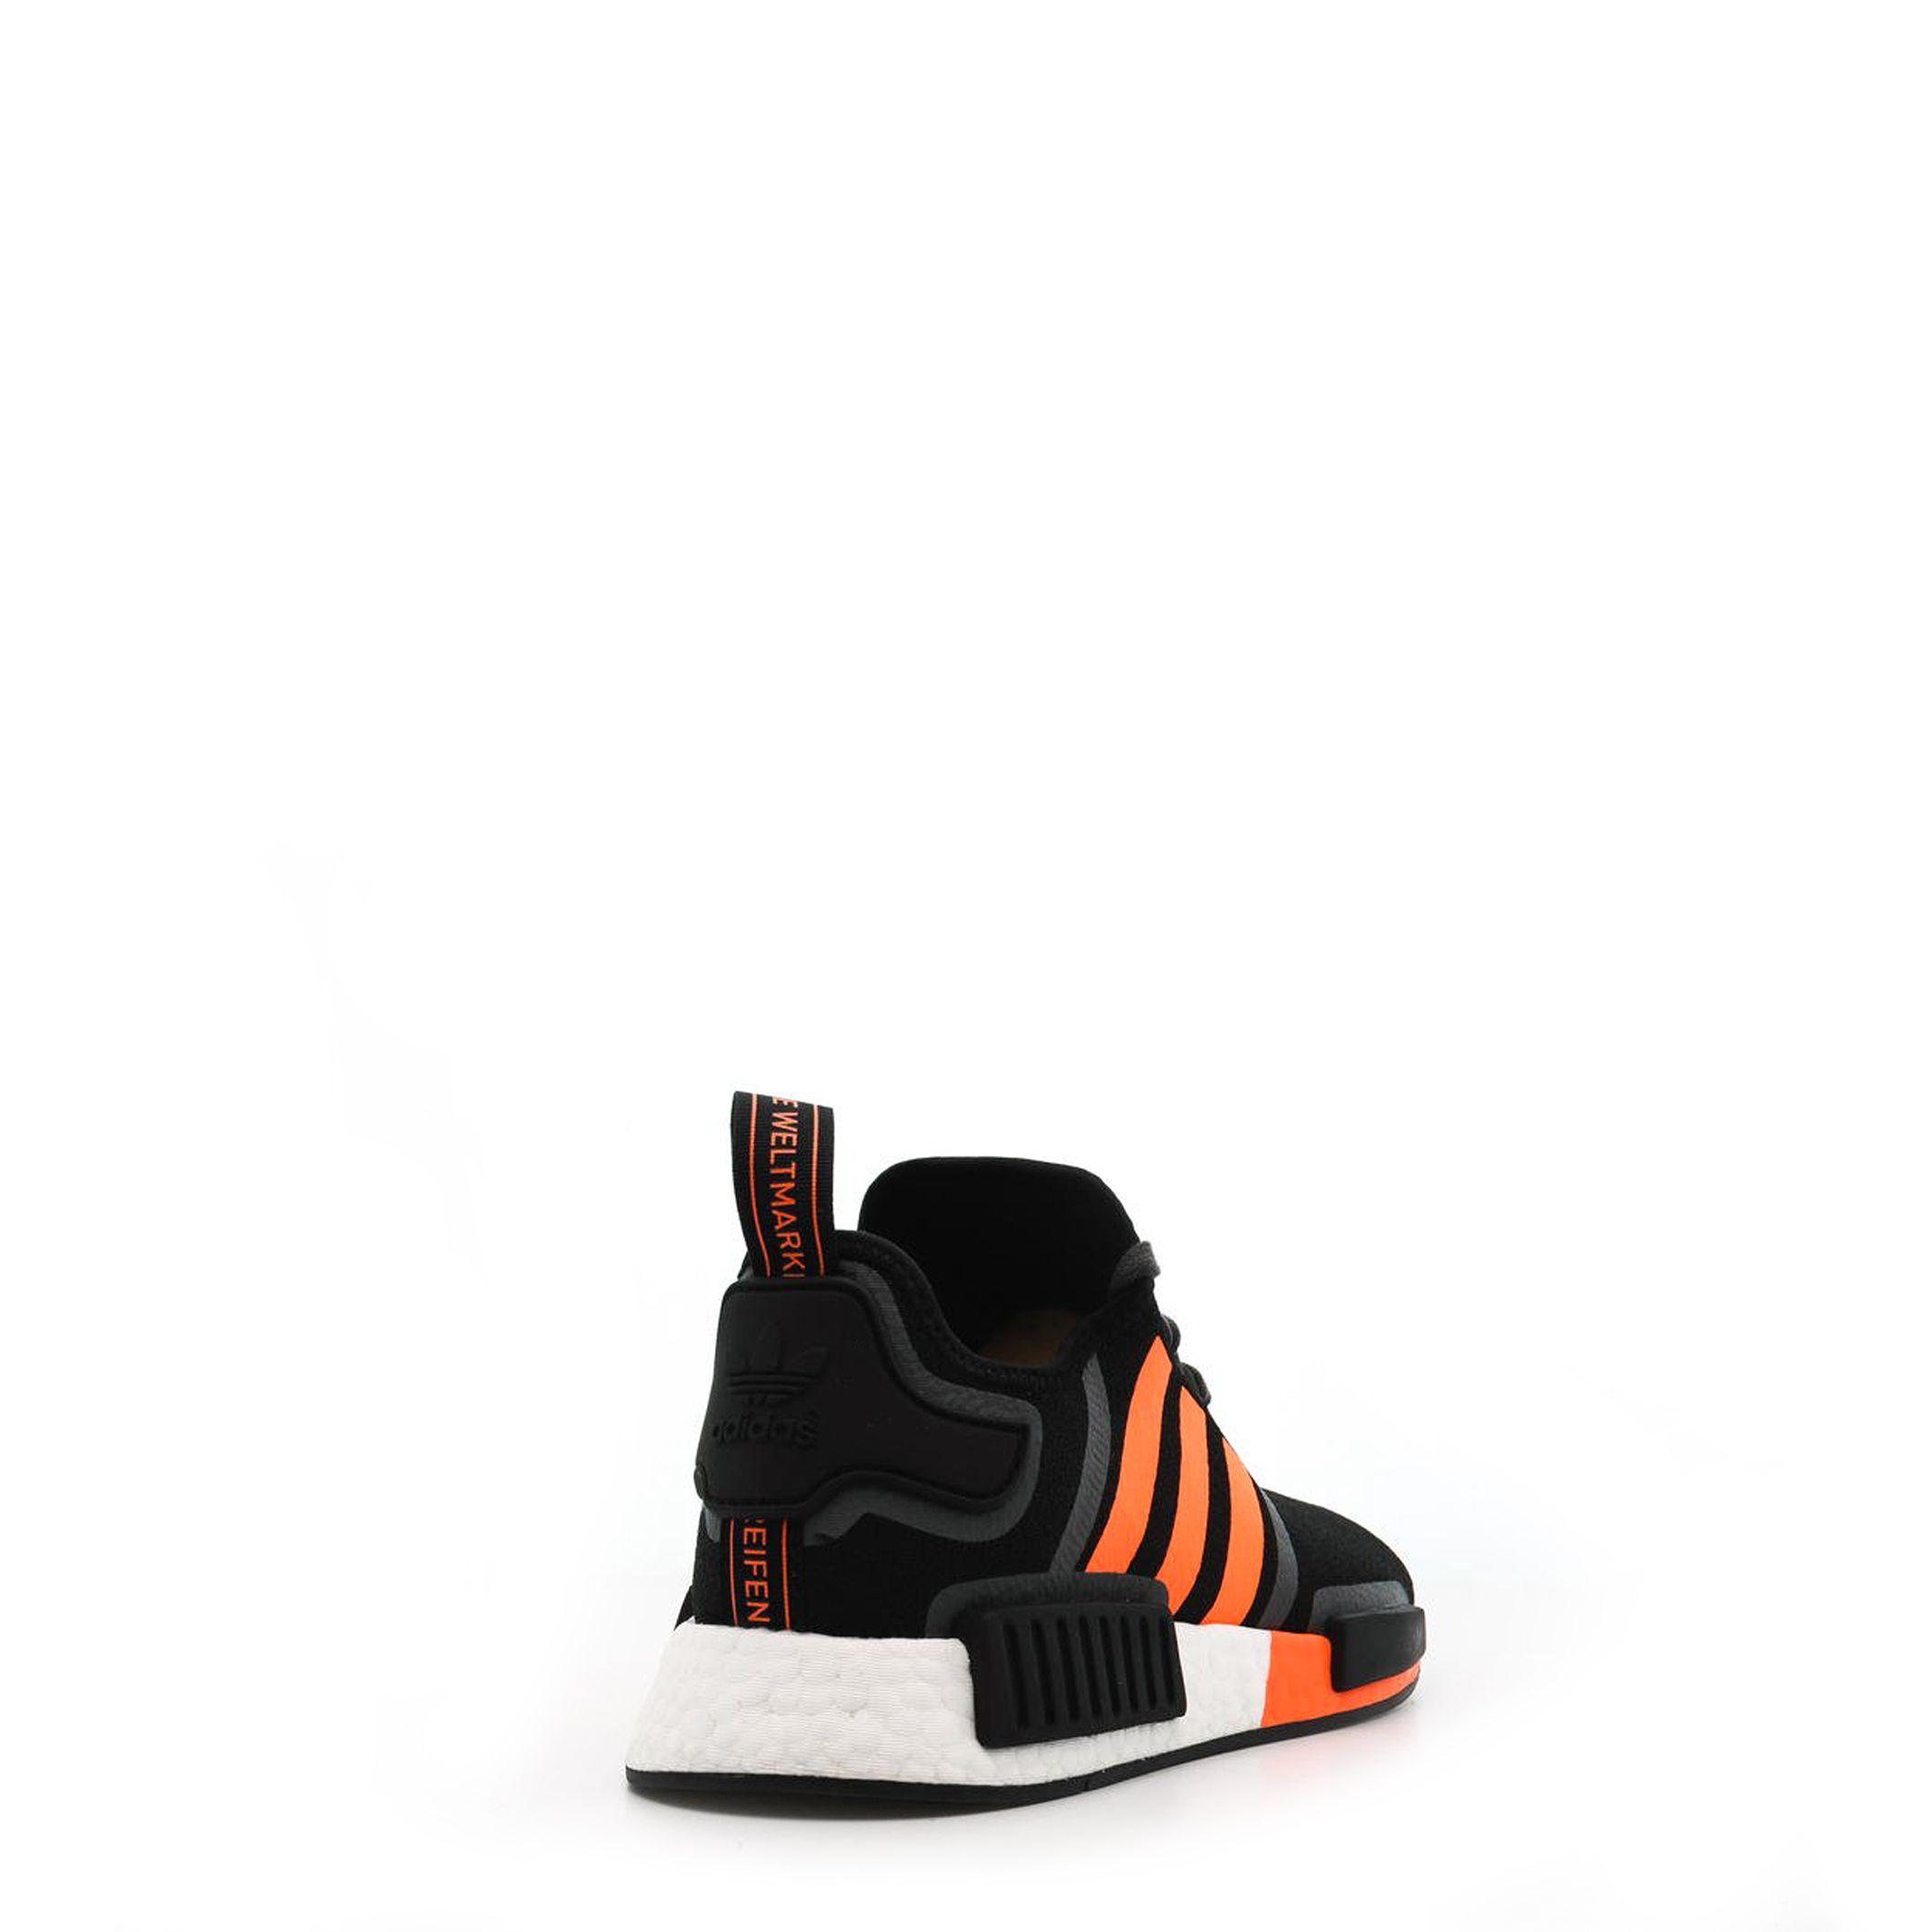 Adidas – NMD_R1 – Zwart Designeritems.nl